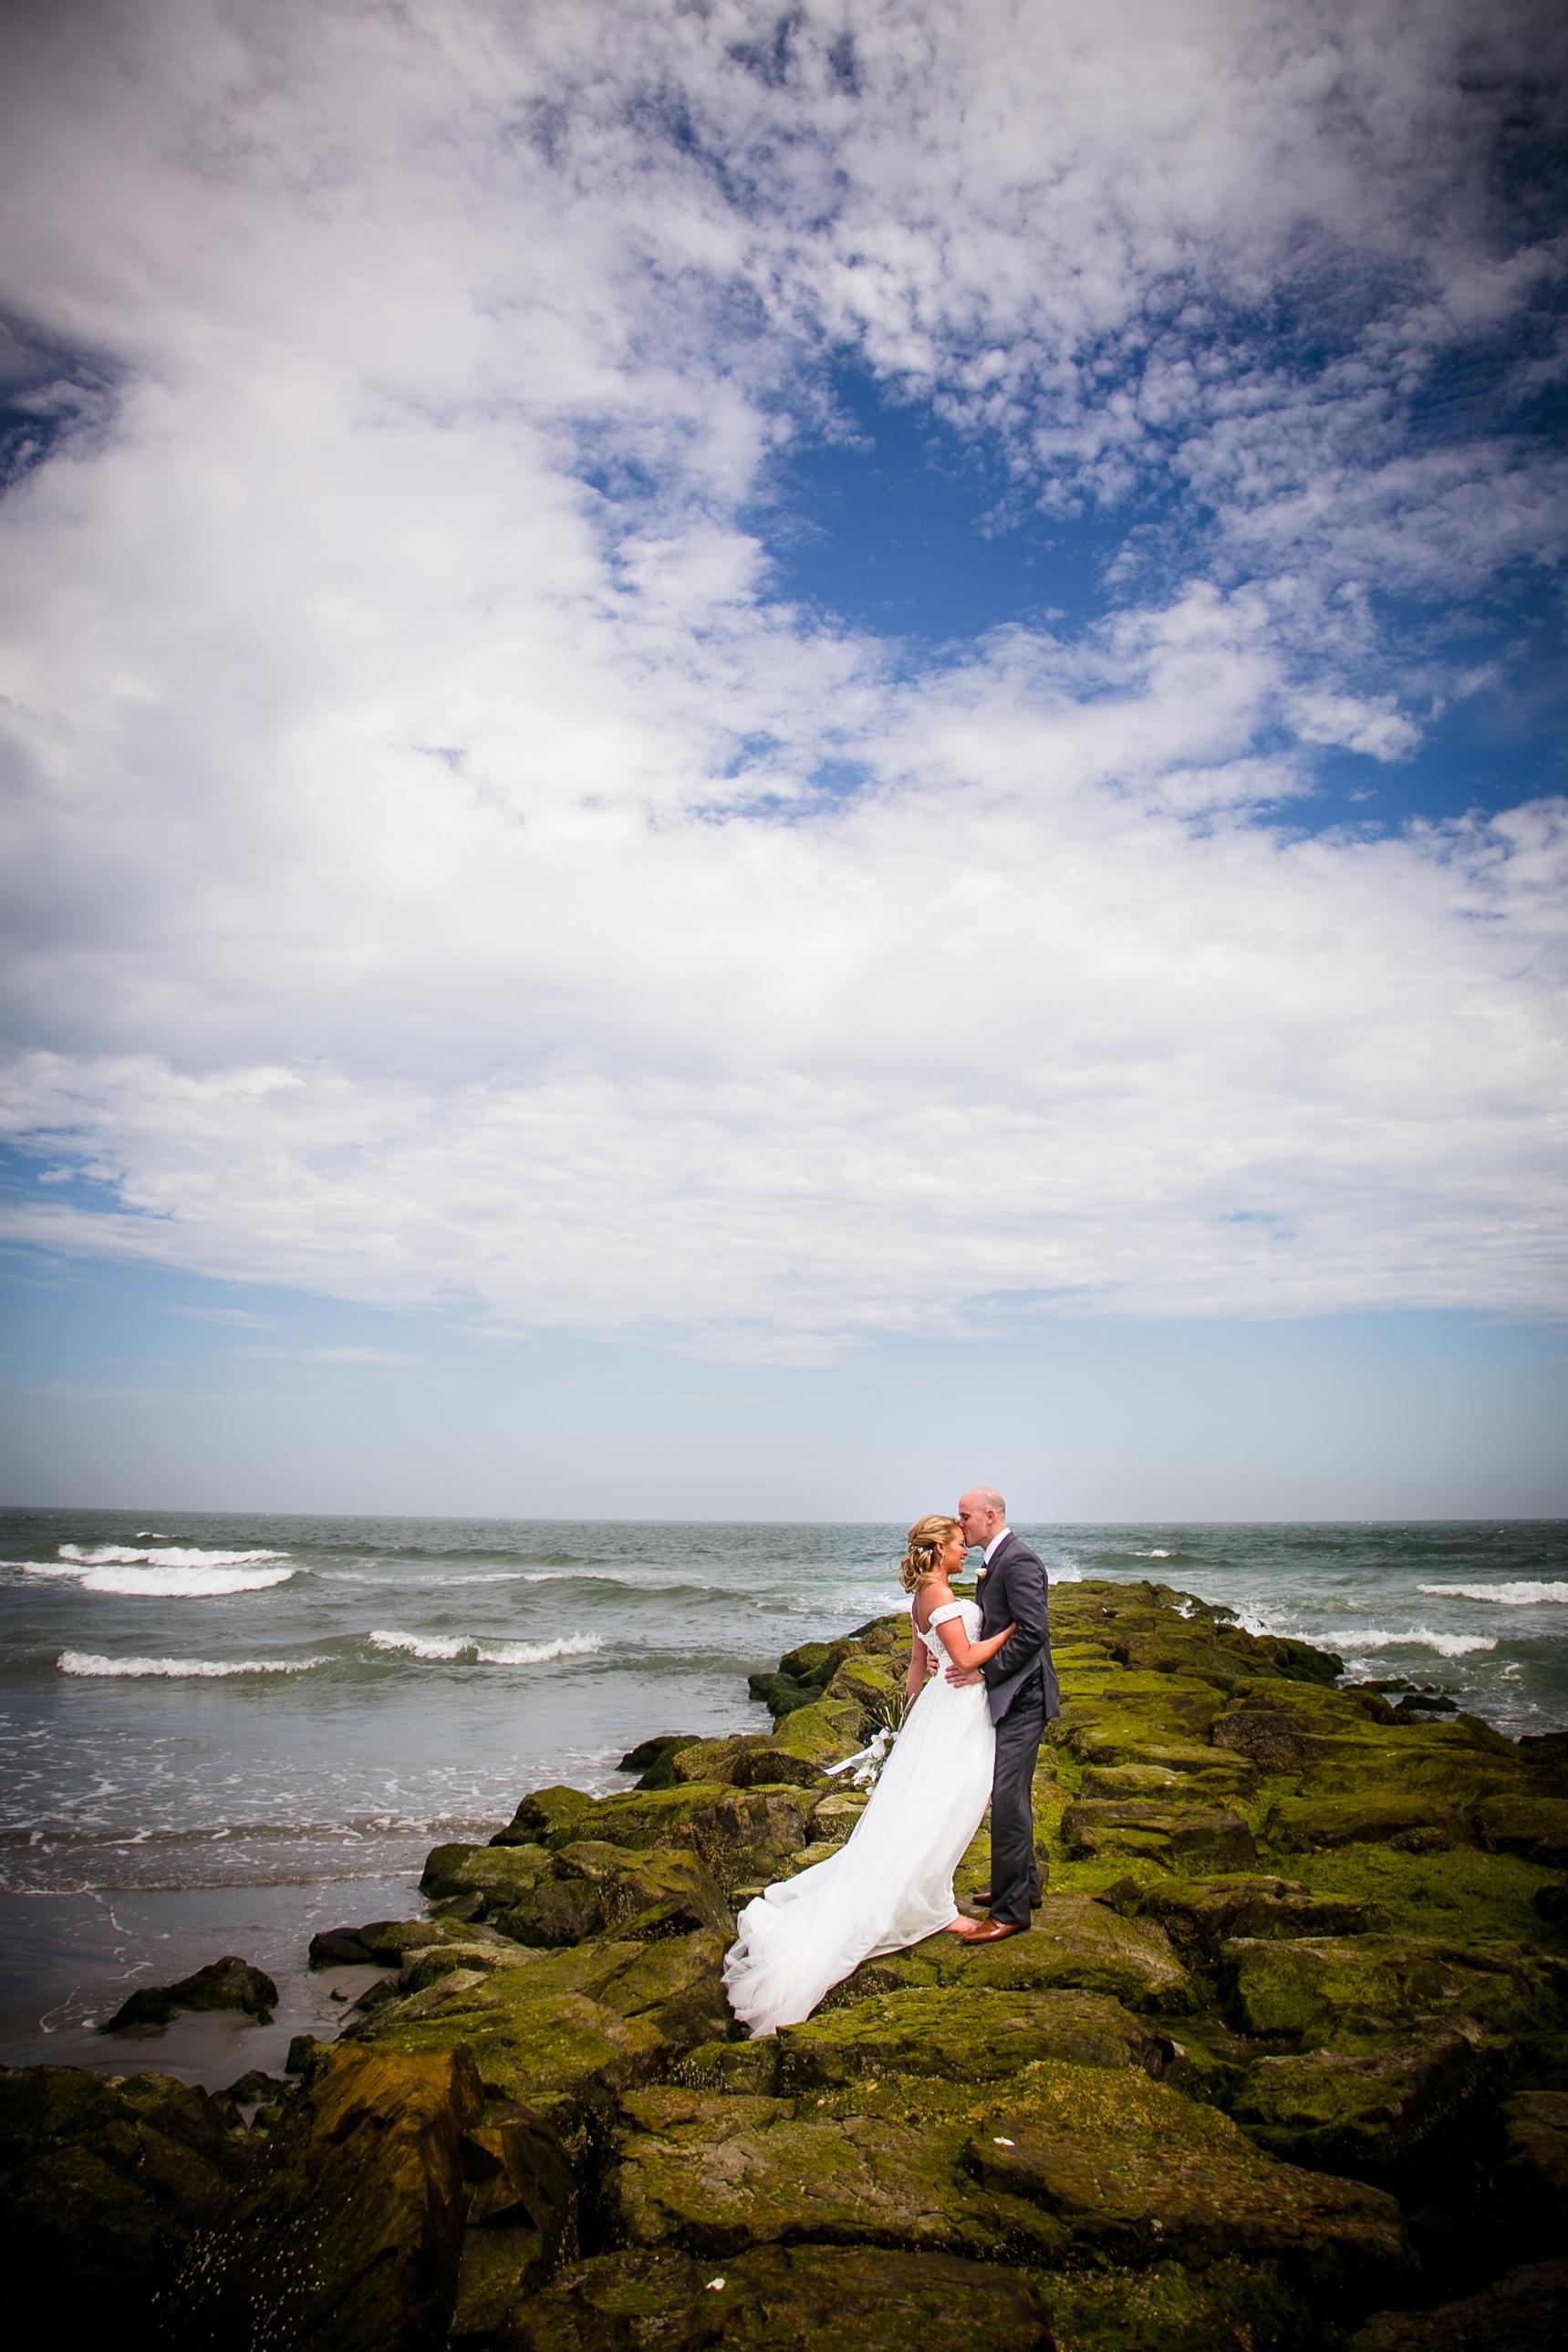 ICONA GOLDEN INN AVALON NJ WEDDING PHOTOGRAPHY  - 034.jpg